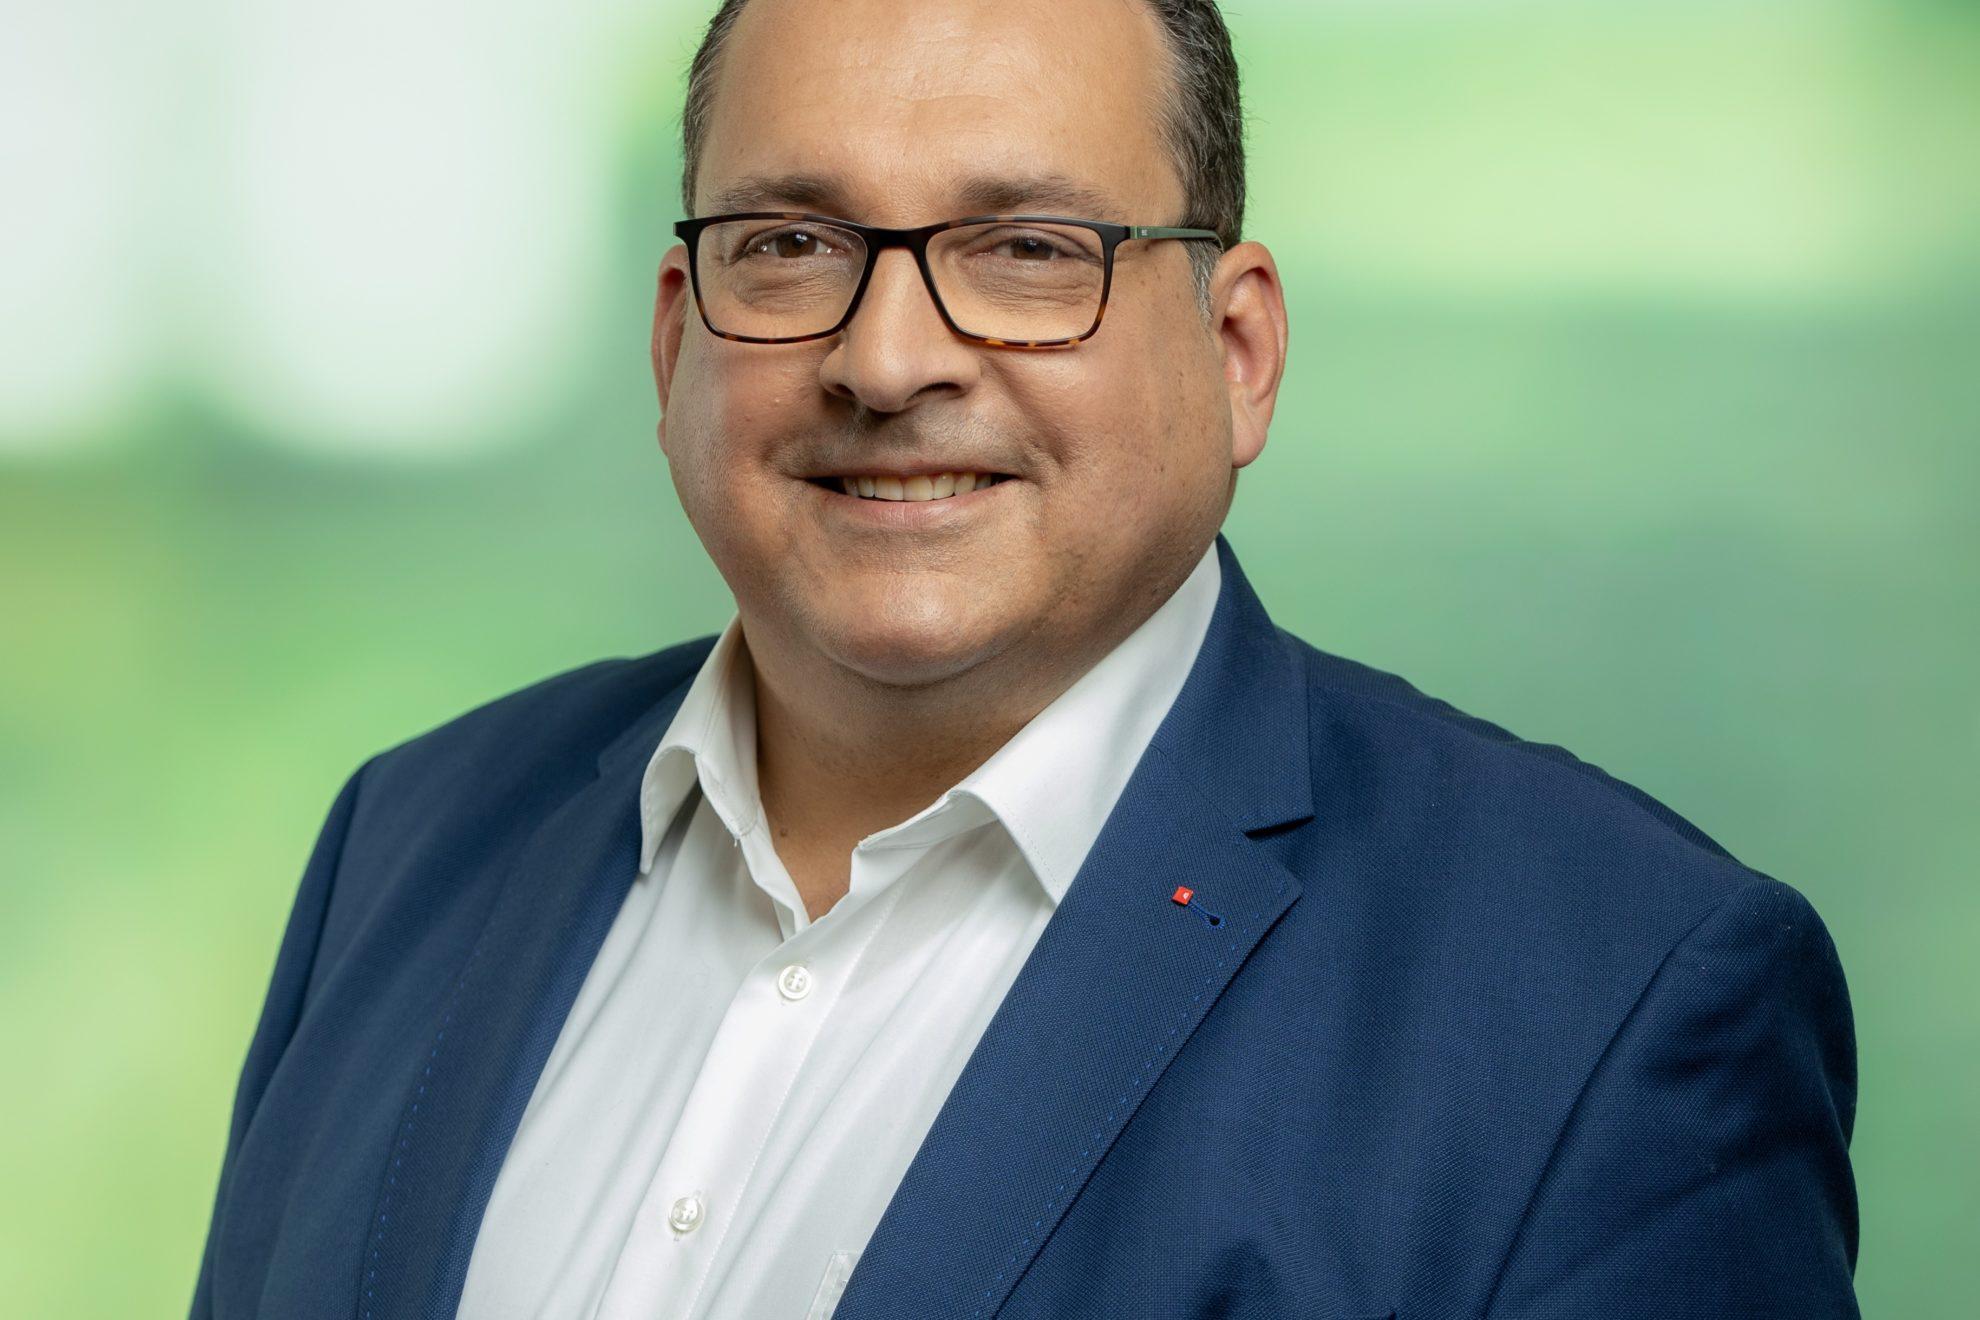 Landratskandidat Jens Geyer